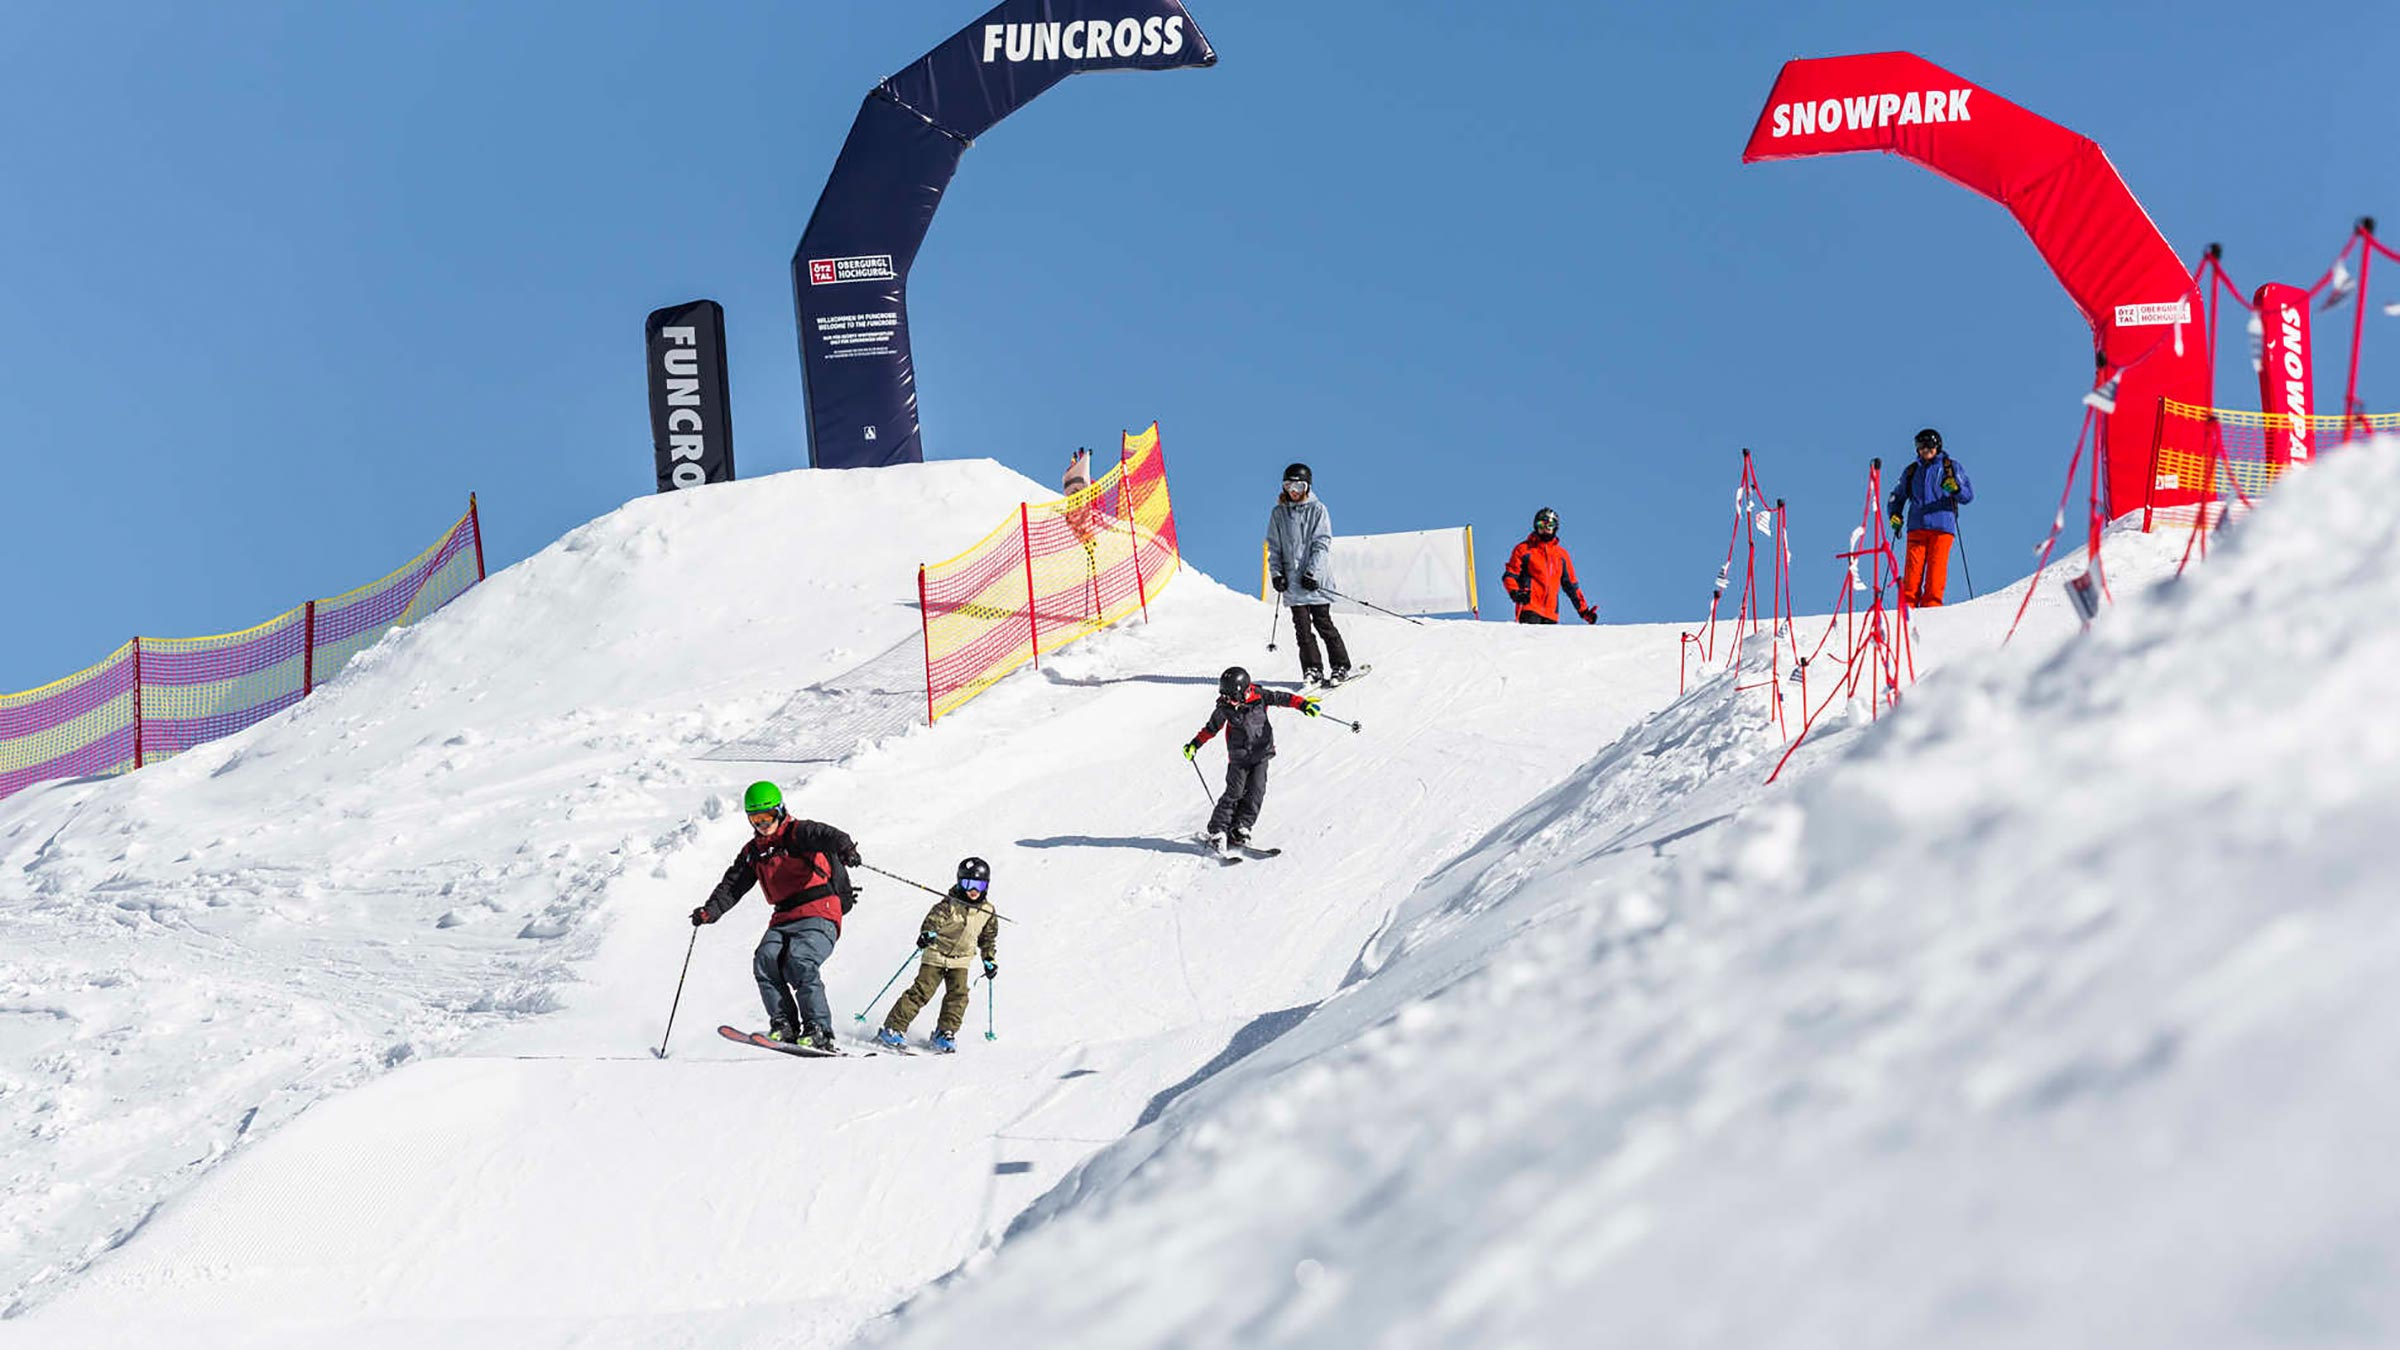 Funcross Obergurgl - Funmountain Obergurgl